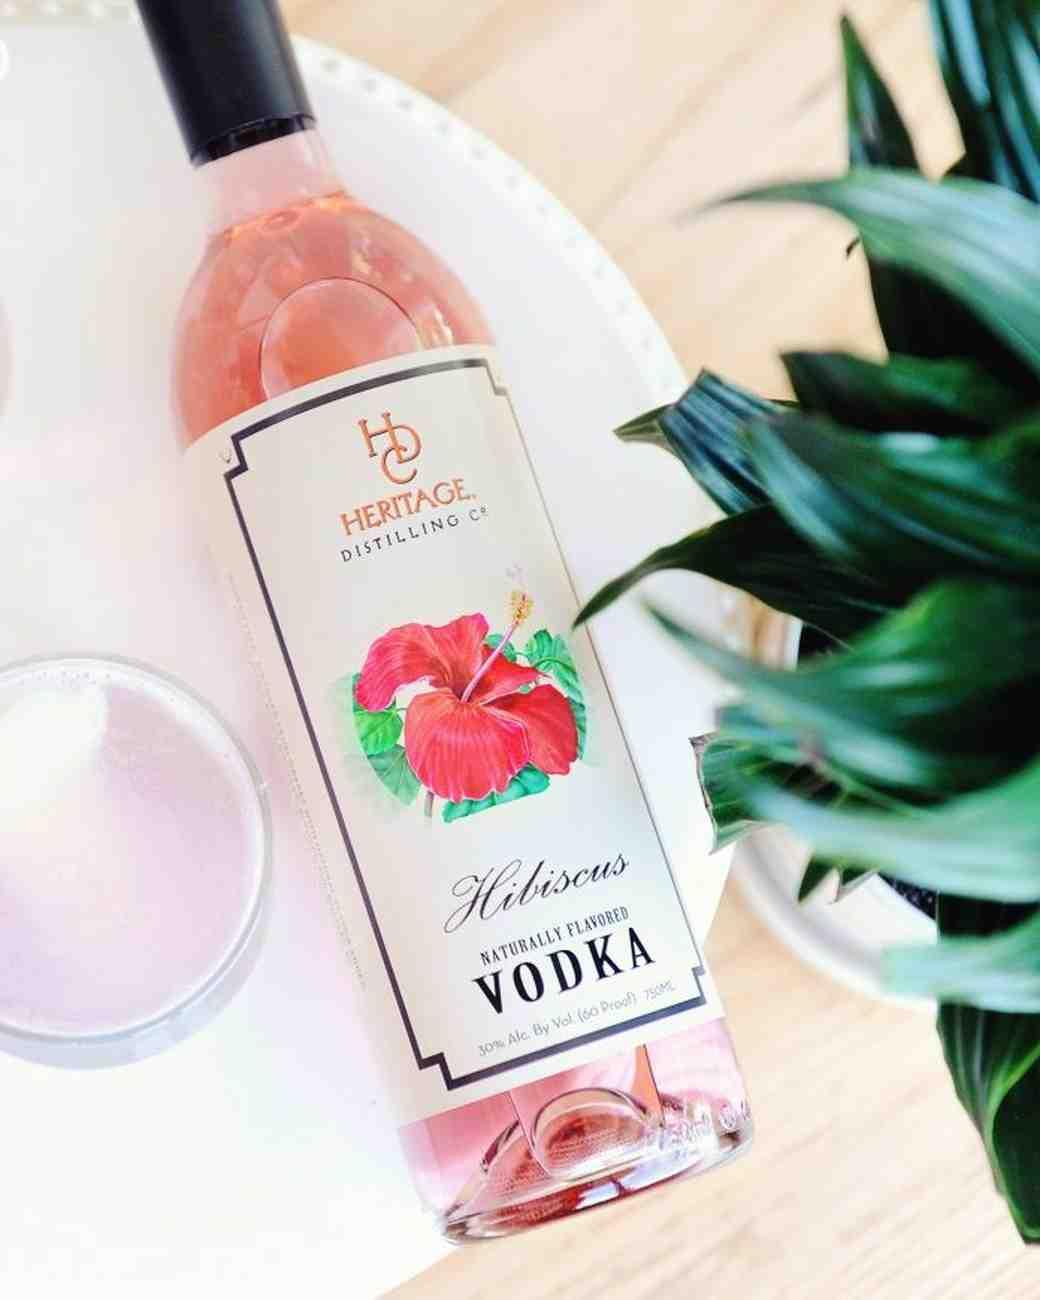 heritage distilling company hibiscus vodka